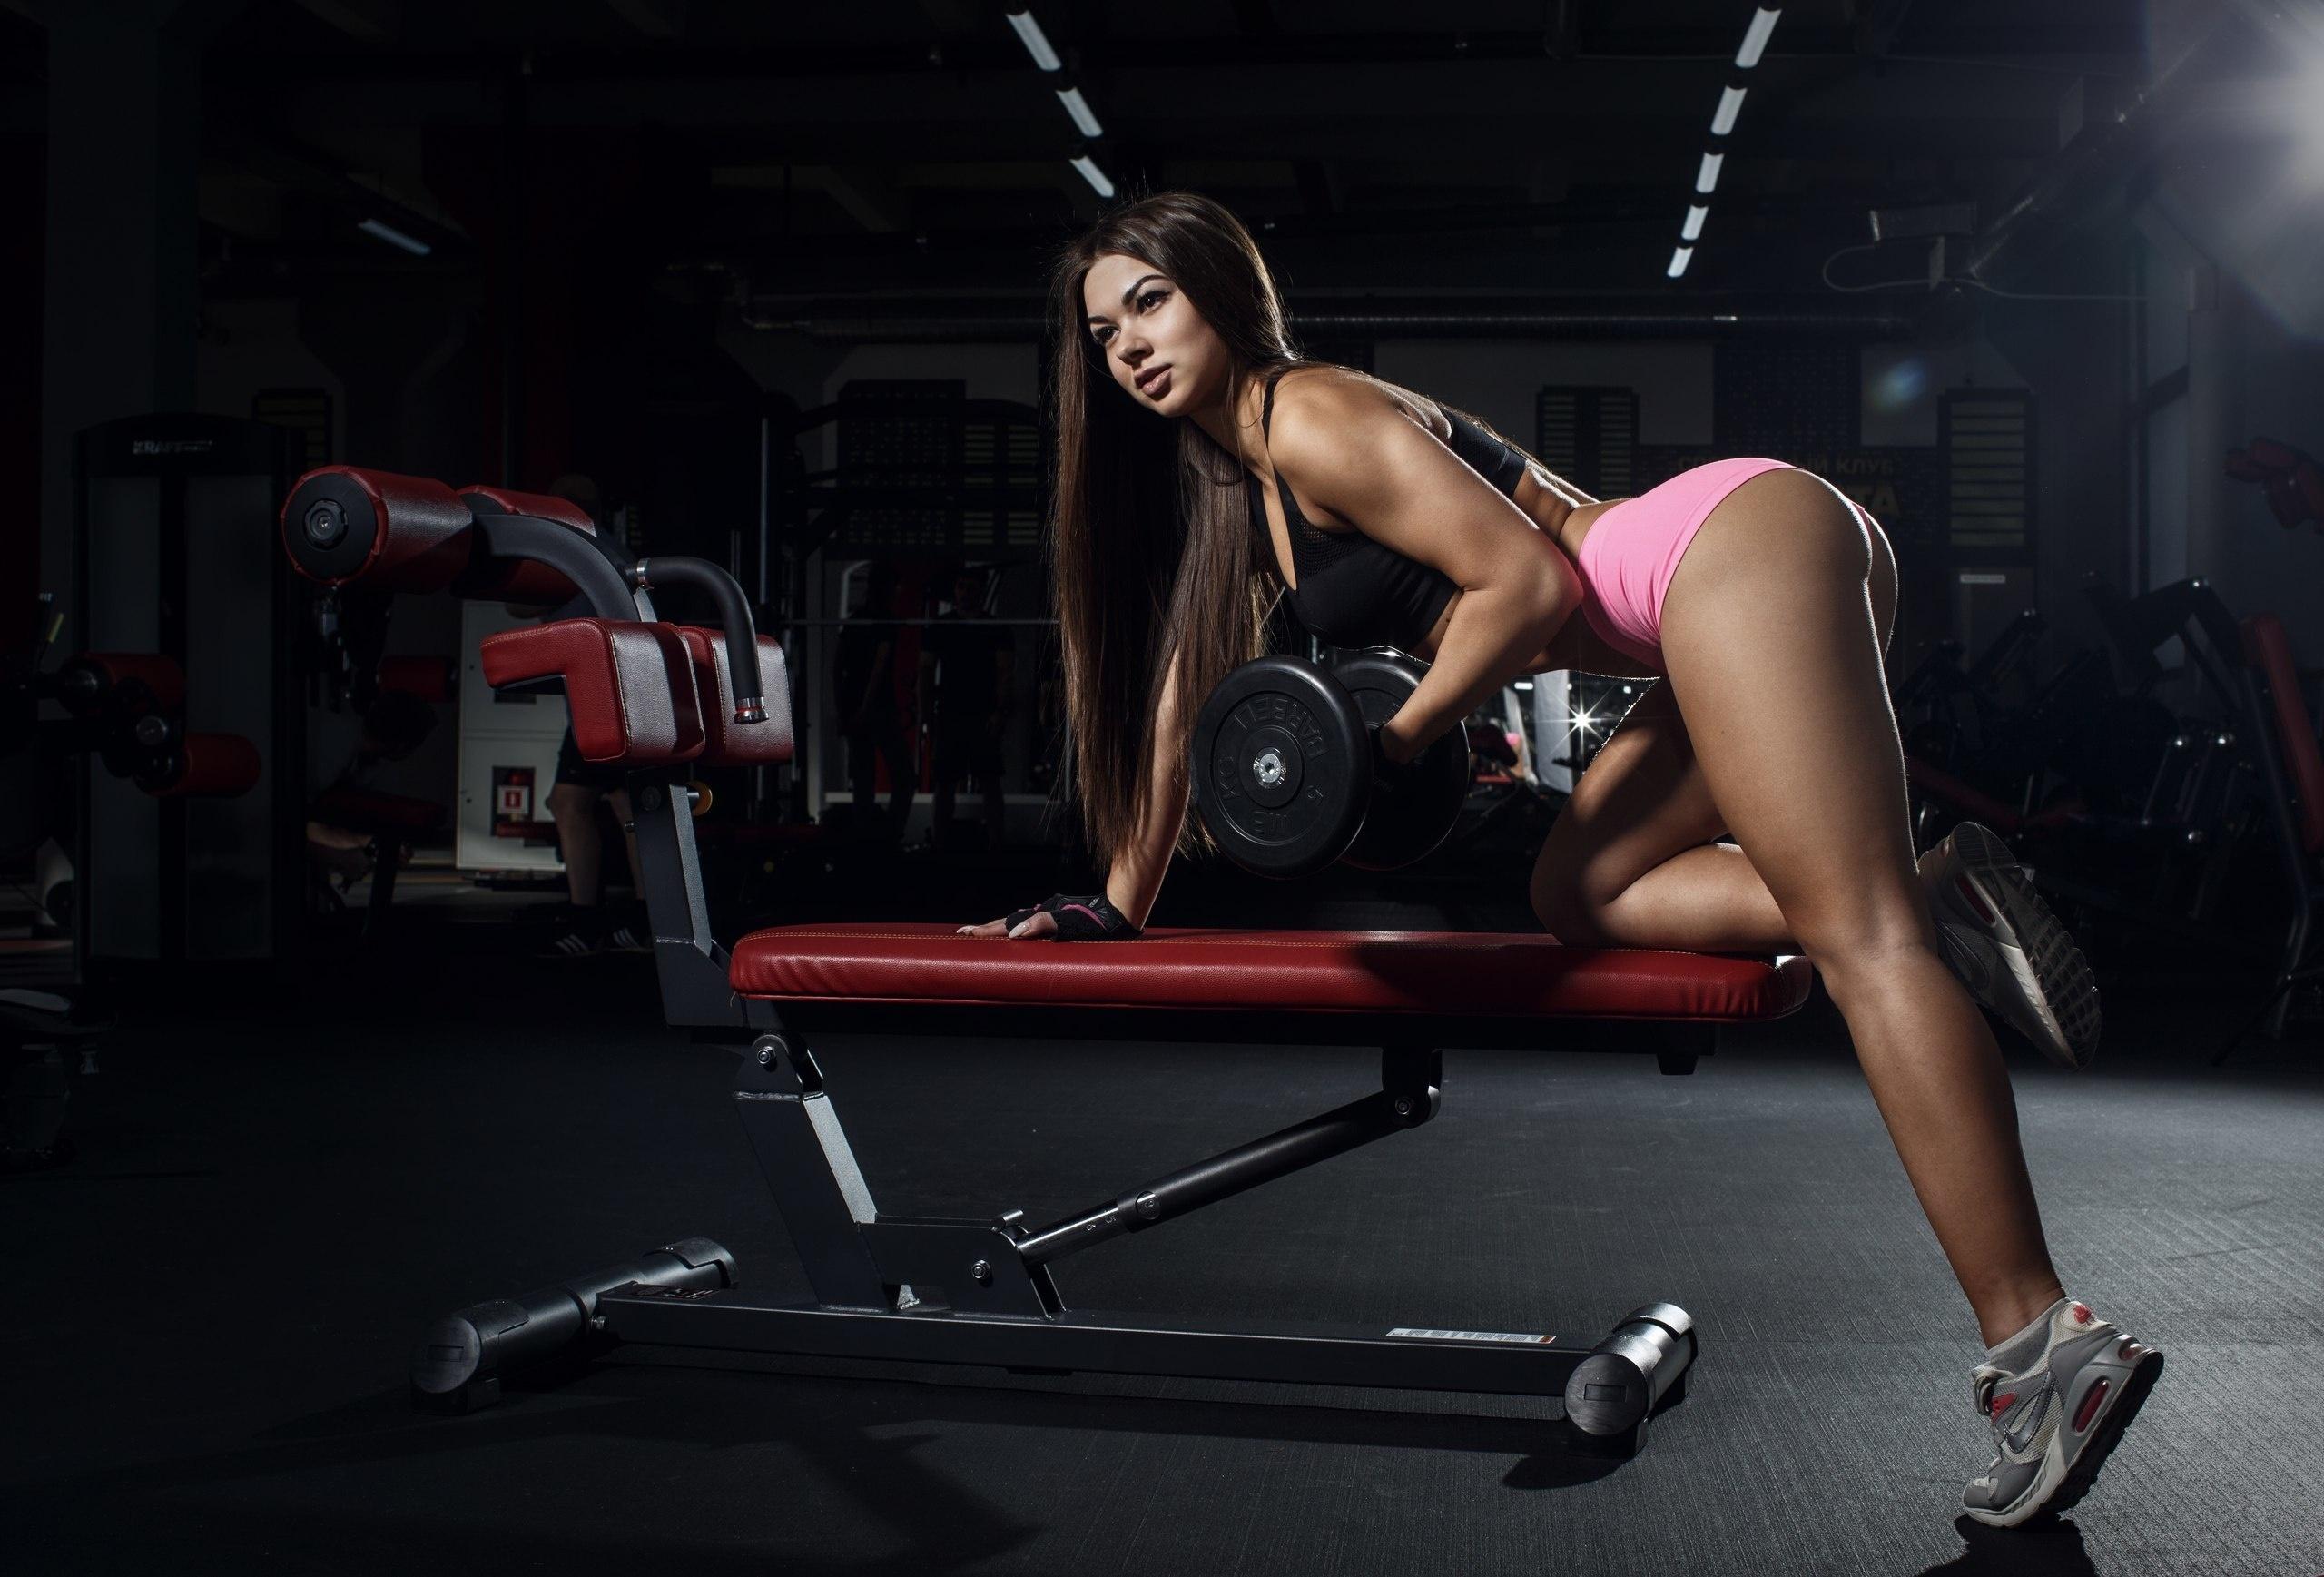 Image: Girl, figure, ass, hair, sports, fitness, dumbbell, exercise, gym